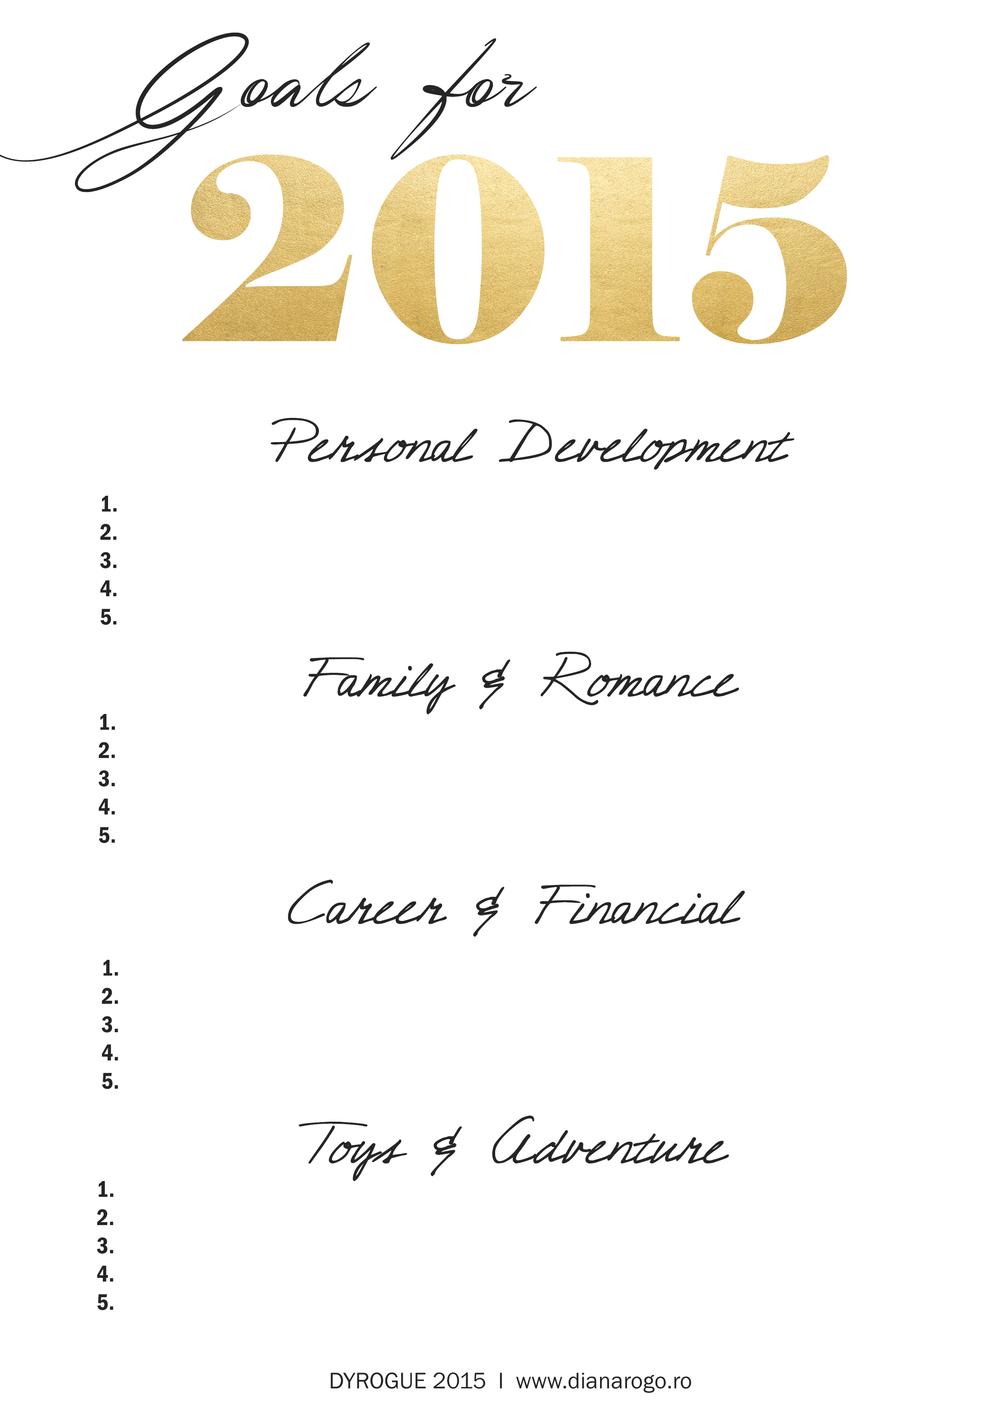 2015 Goal chart Printable on DYROGUE